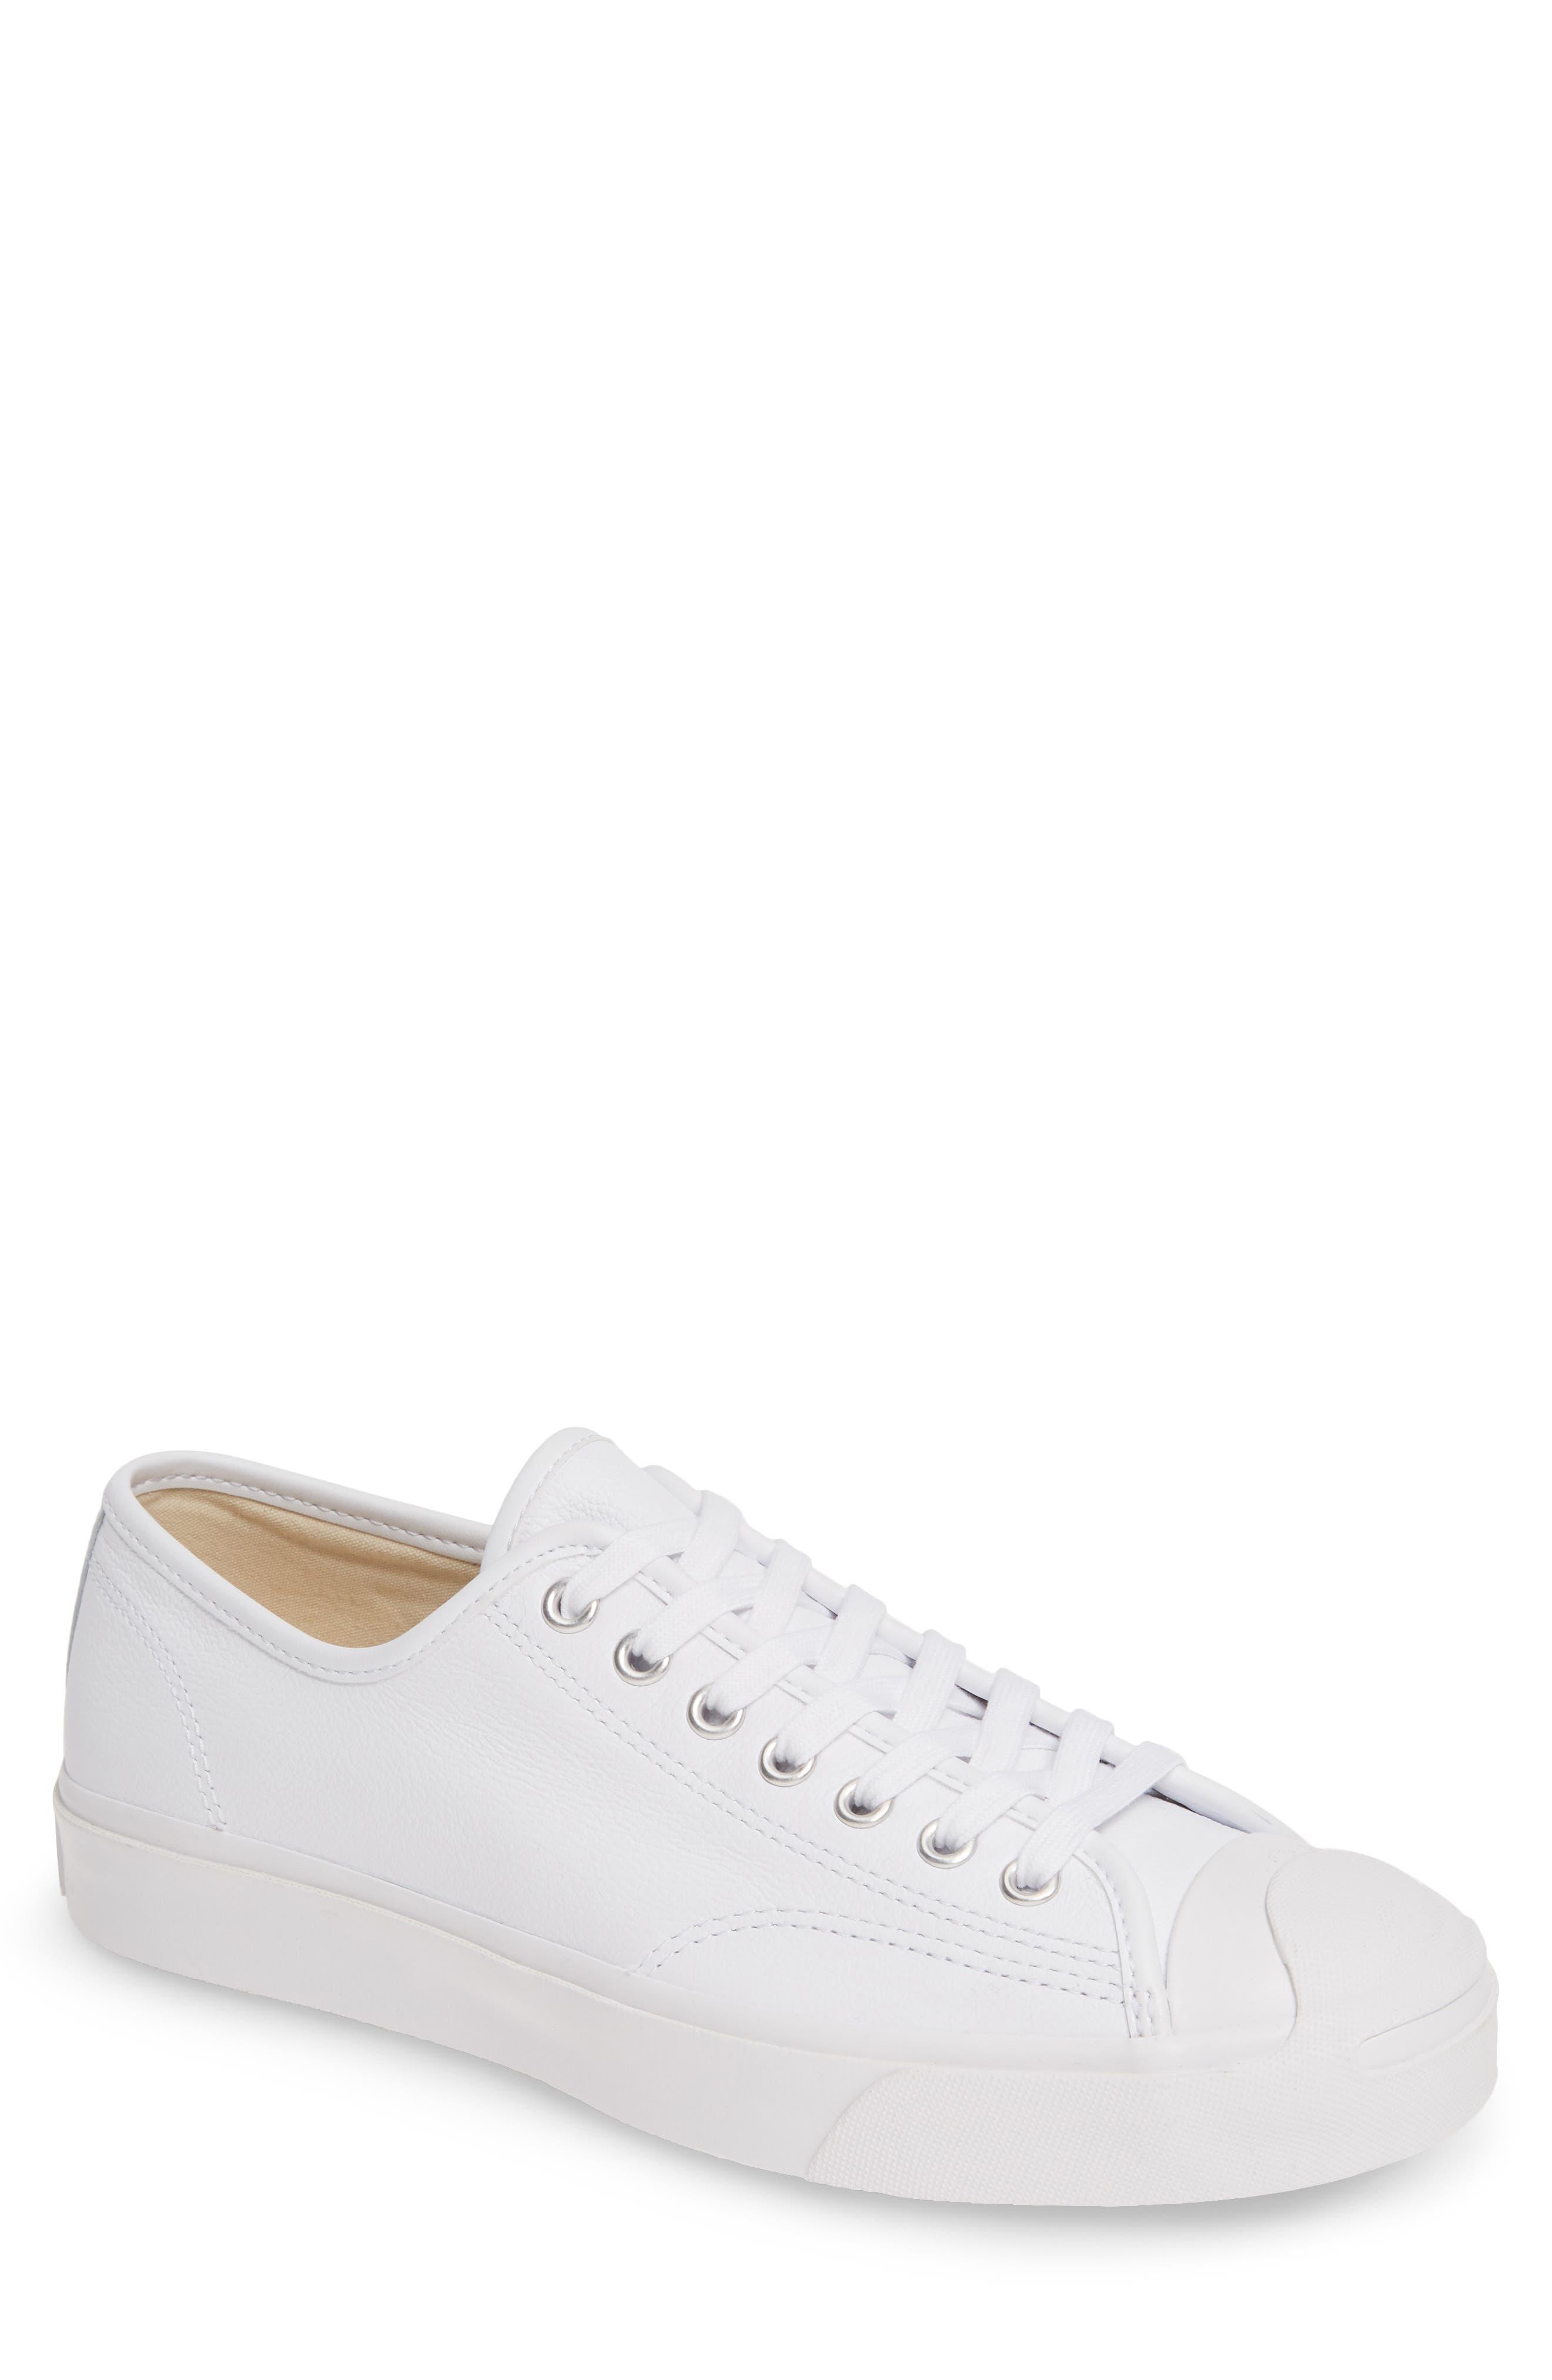 1930s Men's Shoe Styles, Art Deco Era Footwear Mens Converse Jack Purcell Low Top Leather Sneaker Size 9.5 M - White $70.00 AT vintagedancer.com